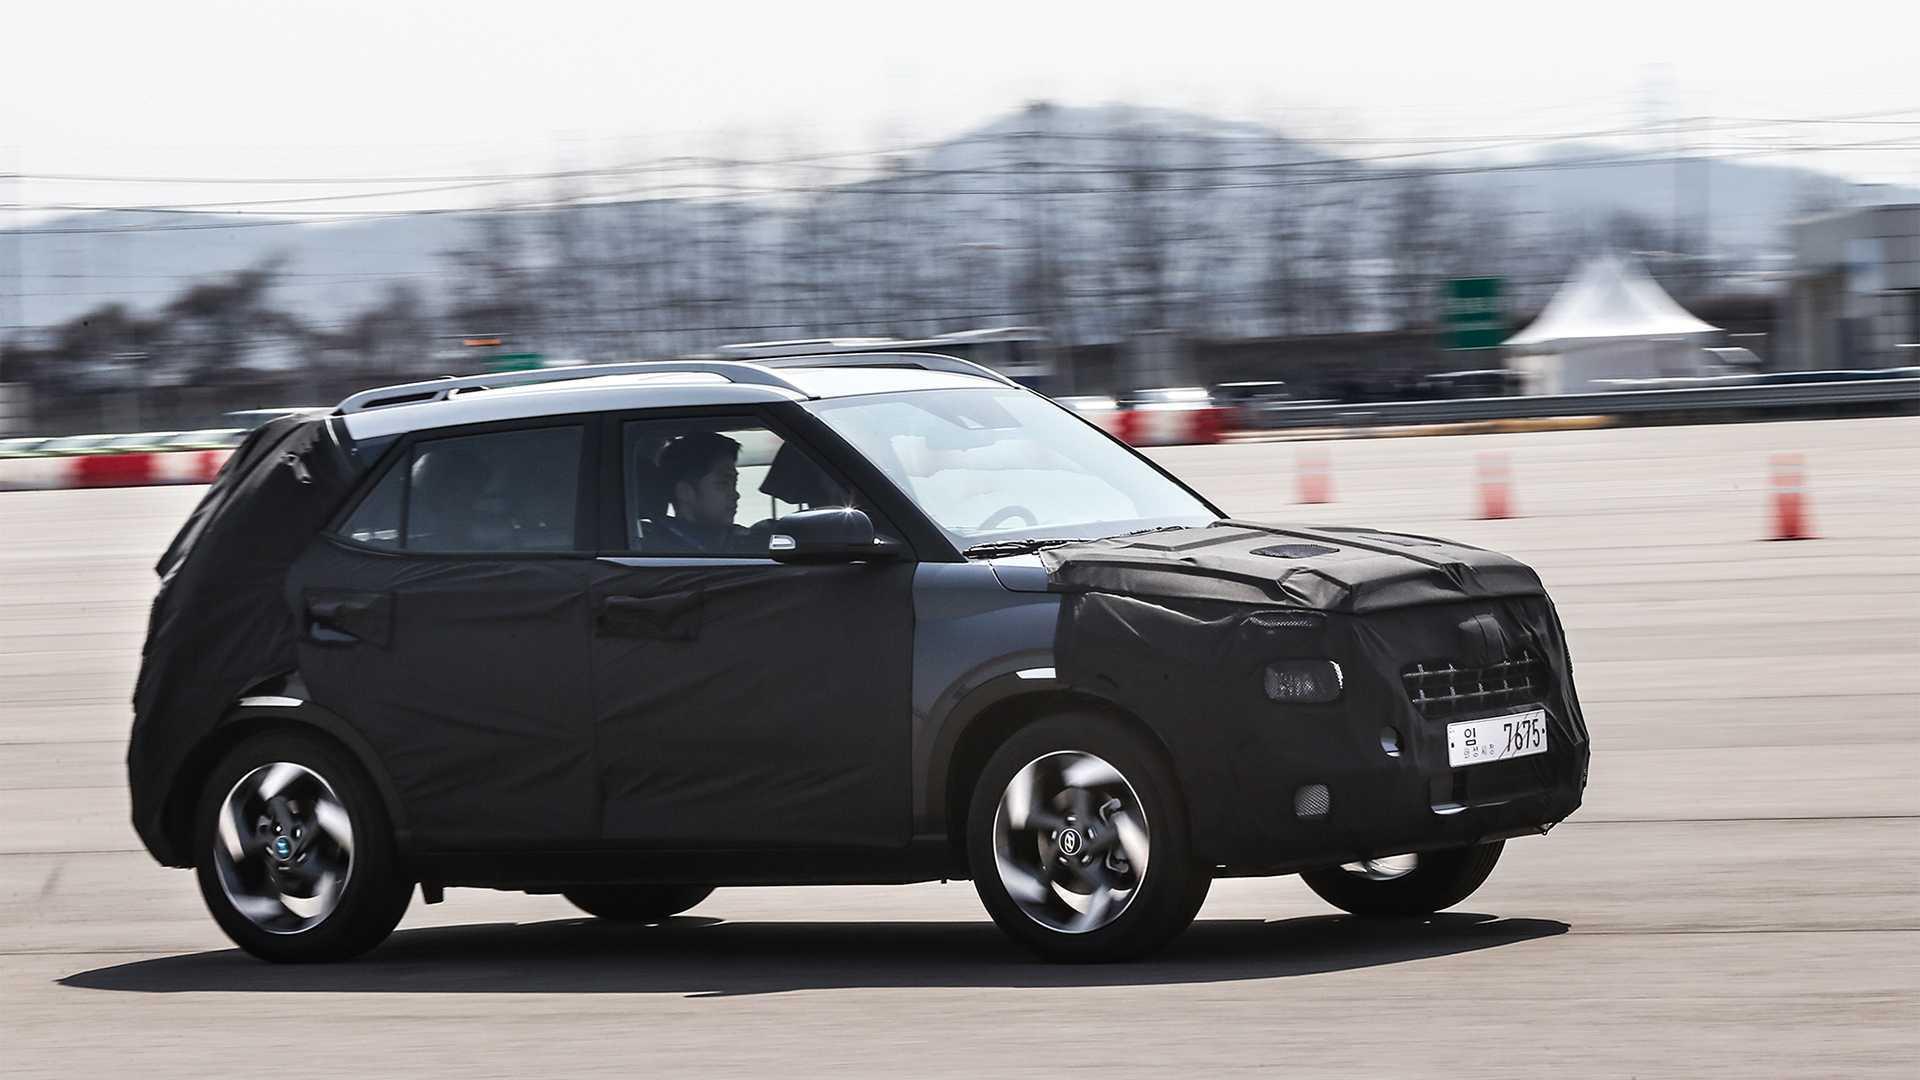 2020 Hyundai Venue: Design, Specs, Equipment, Price >> 2020 Hyundai Venue Prototype First Drive Affordable Spunk